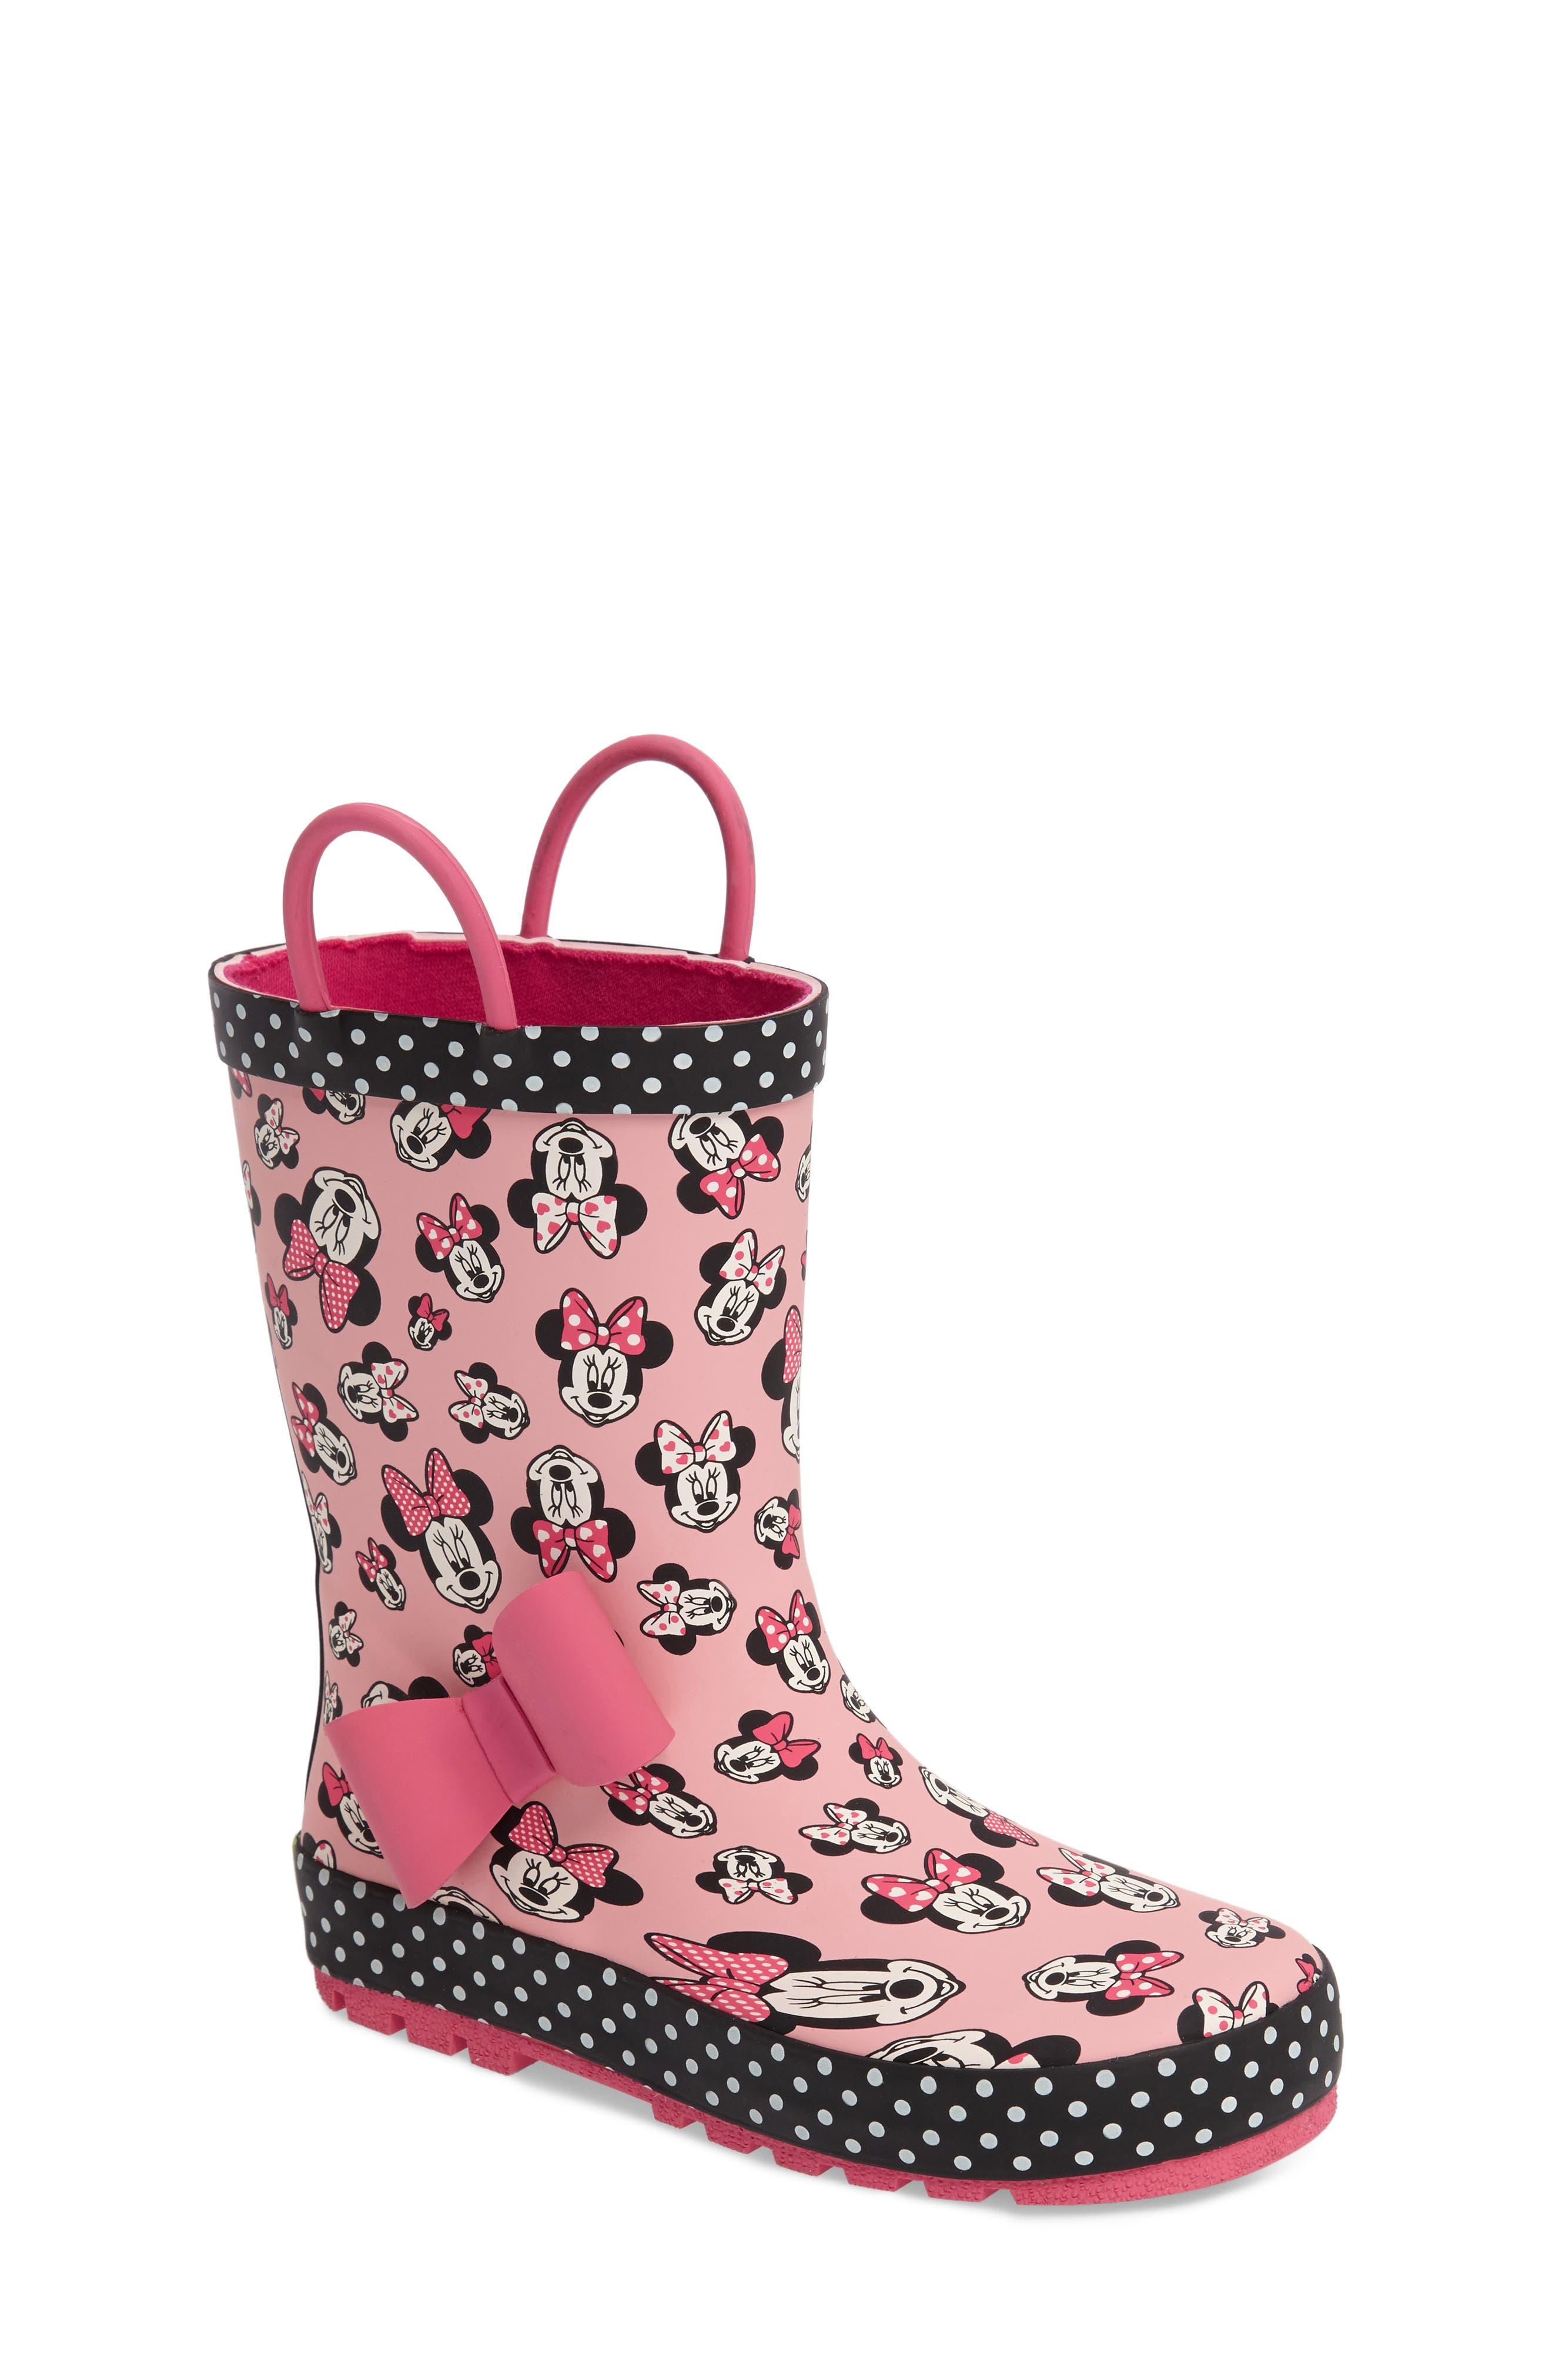 Disney<sup>®</sup> Minnie Mouse Waterproof Rain Boot,                             Main thumbnail 1, color,                             680